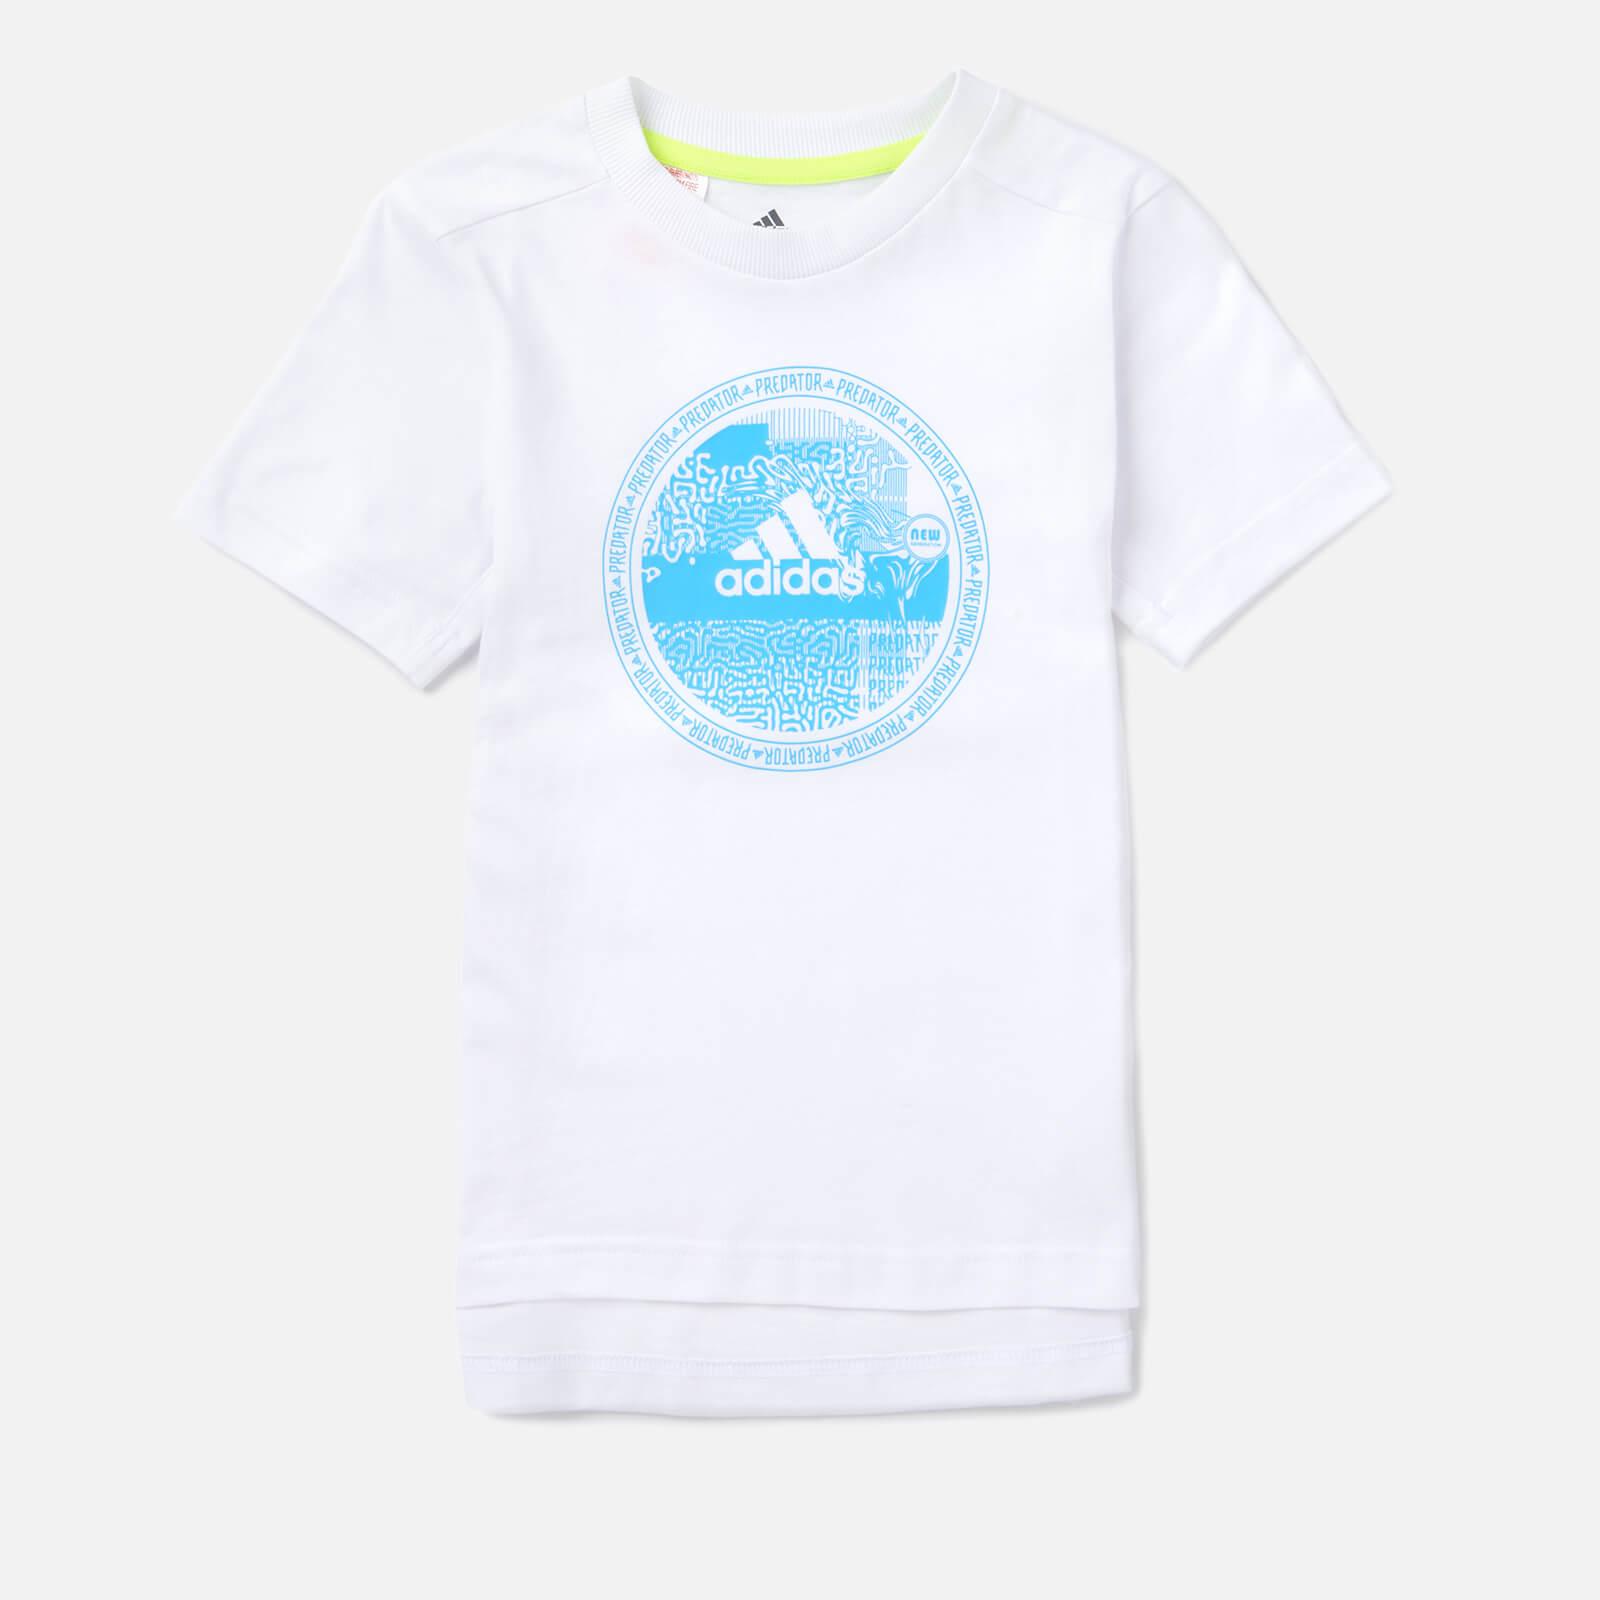 adidas Boys' Young Boys Predator T-Shirt - White - 11-12 Years